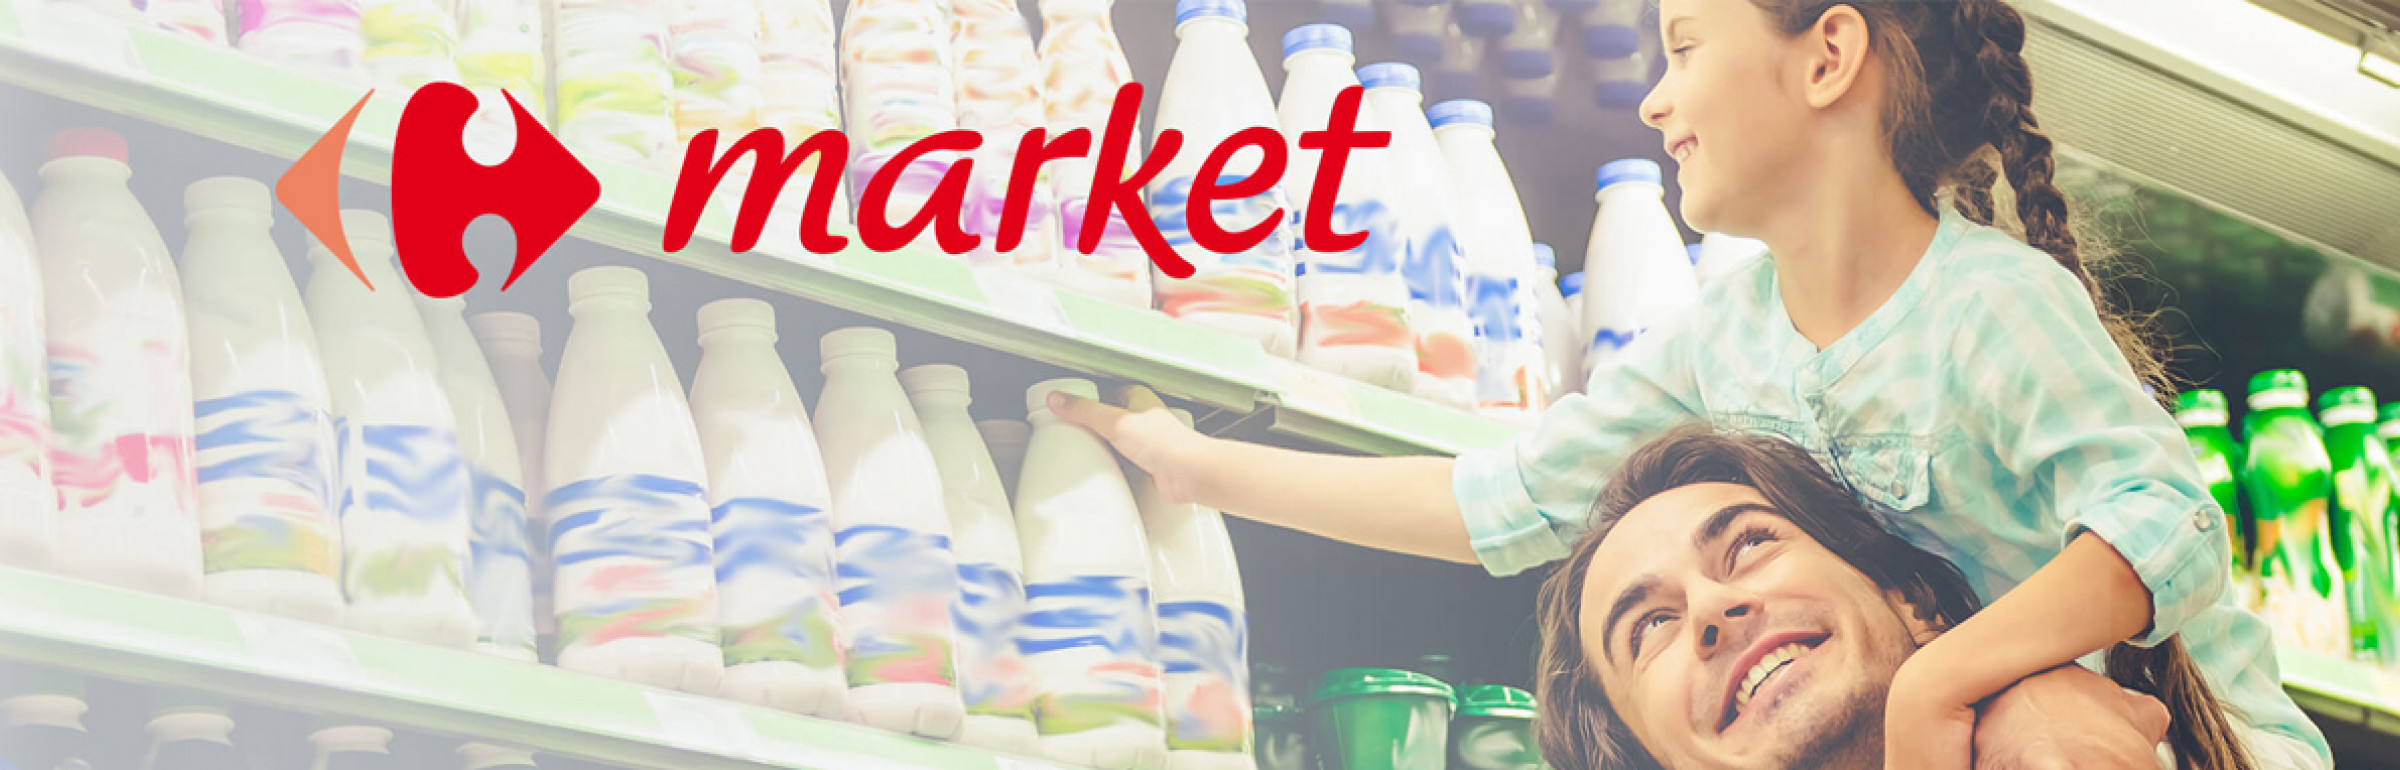 Banner Carrefour Market